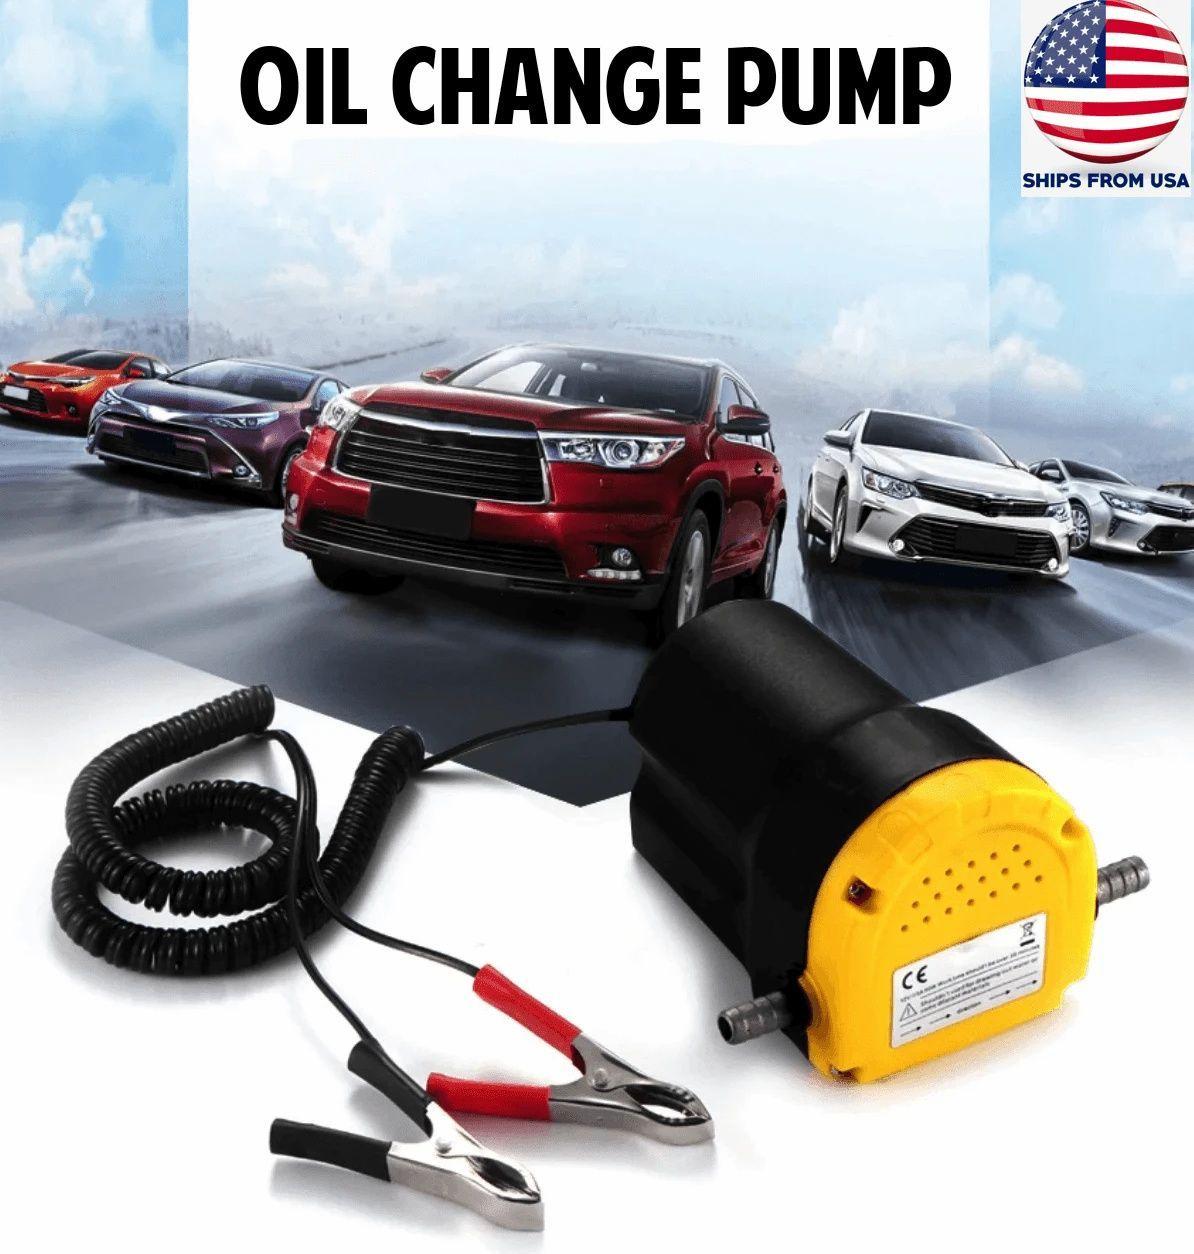 Automotive In 2020 Oil Change Pumps Jack Stands